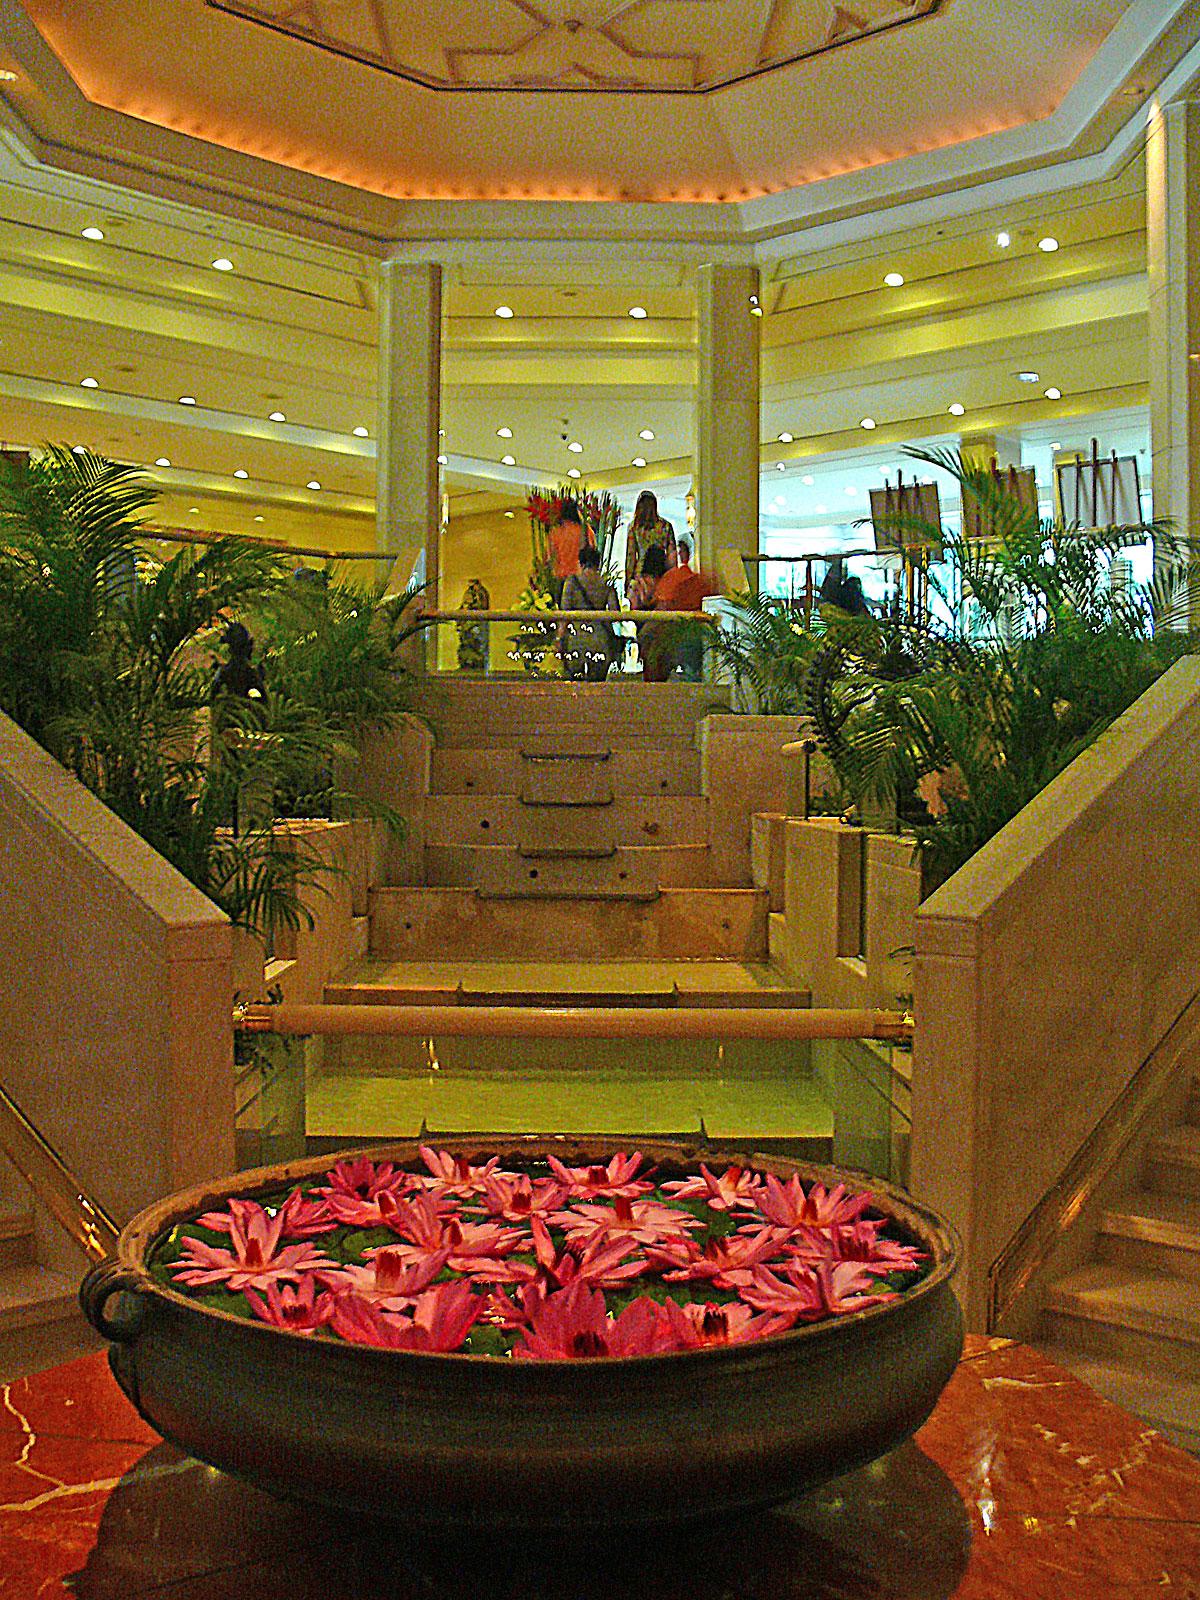 INDIEN MUMBAI Hotel The Leela FINEST-onTour P1030632.jpg